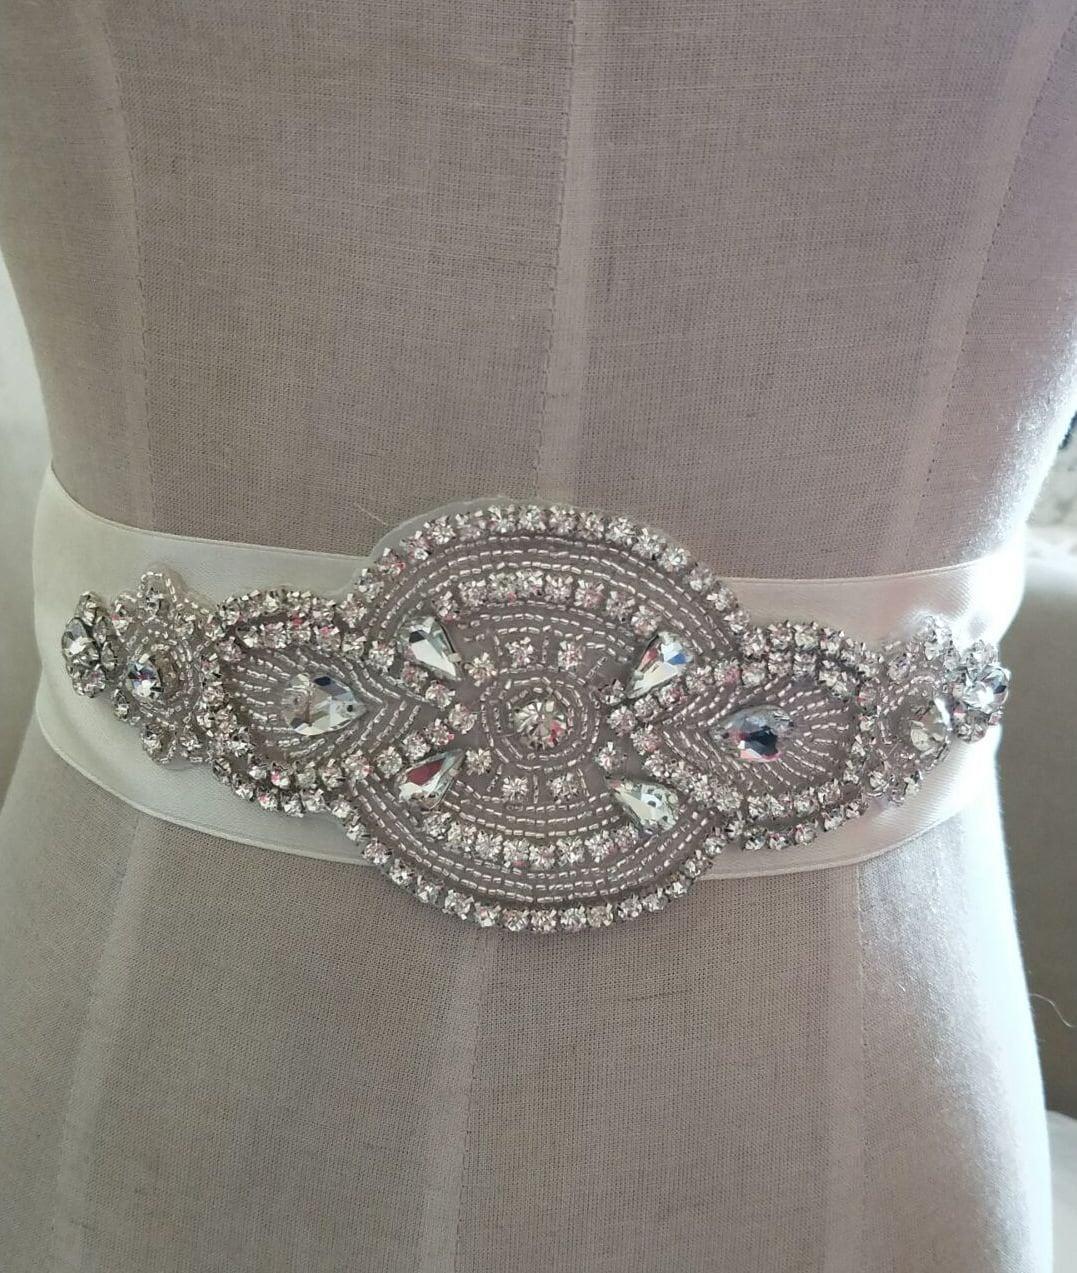 Rhinestone Applique Crystal Trim Rhinestone Beaded Applique Bridal  Accessories Wedding Dress Sash Belt Headband from Lacebeauty on Etsy Studio 9f25a6a3c70d